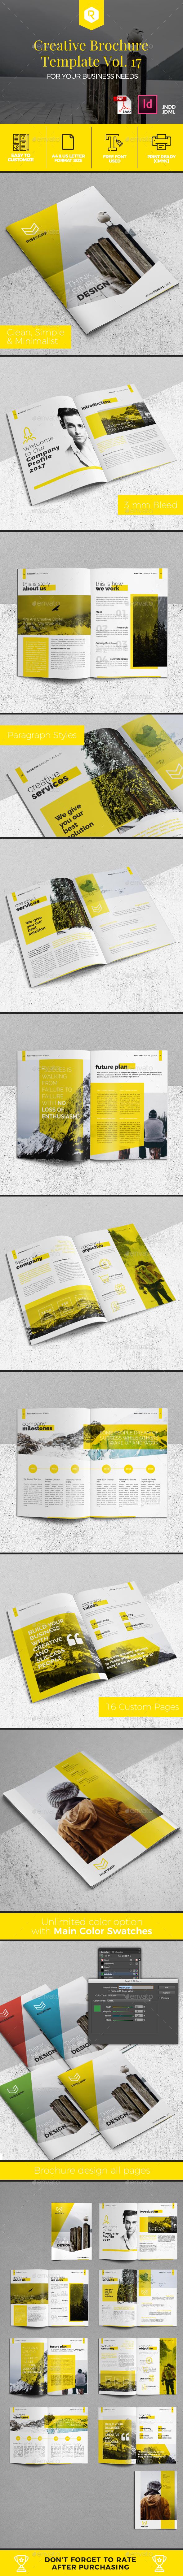 Creative Brochure Template Vol. 17 - Corporate Brochures